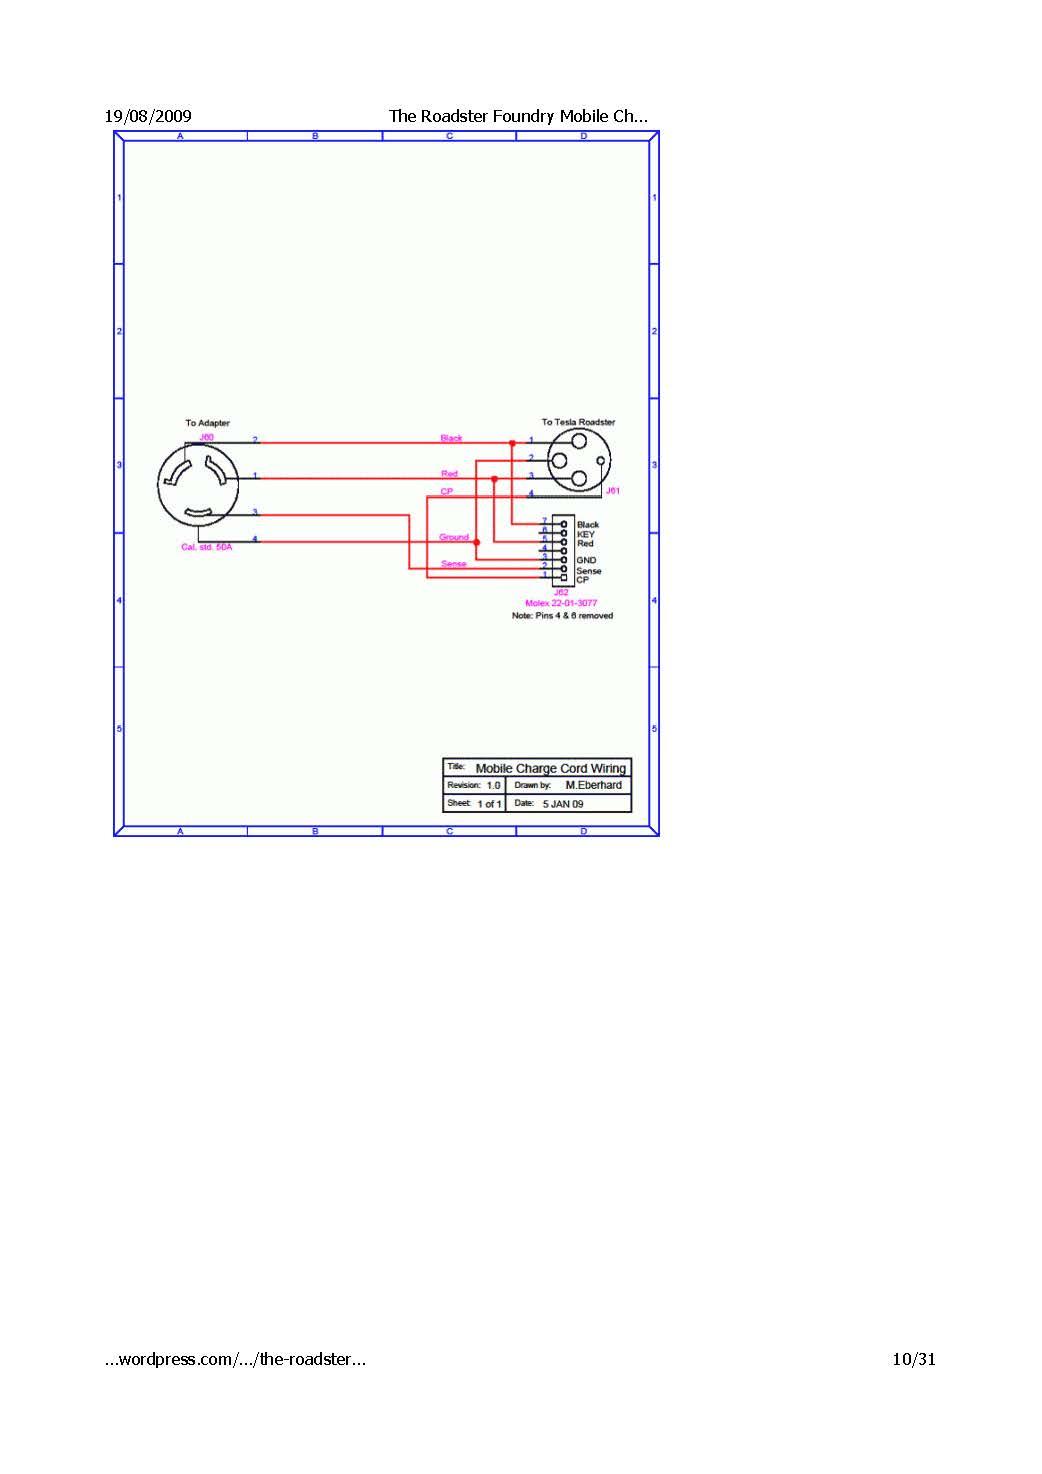 RFMC_01_Page_10.jpg